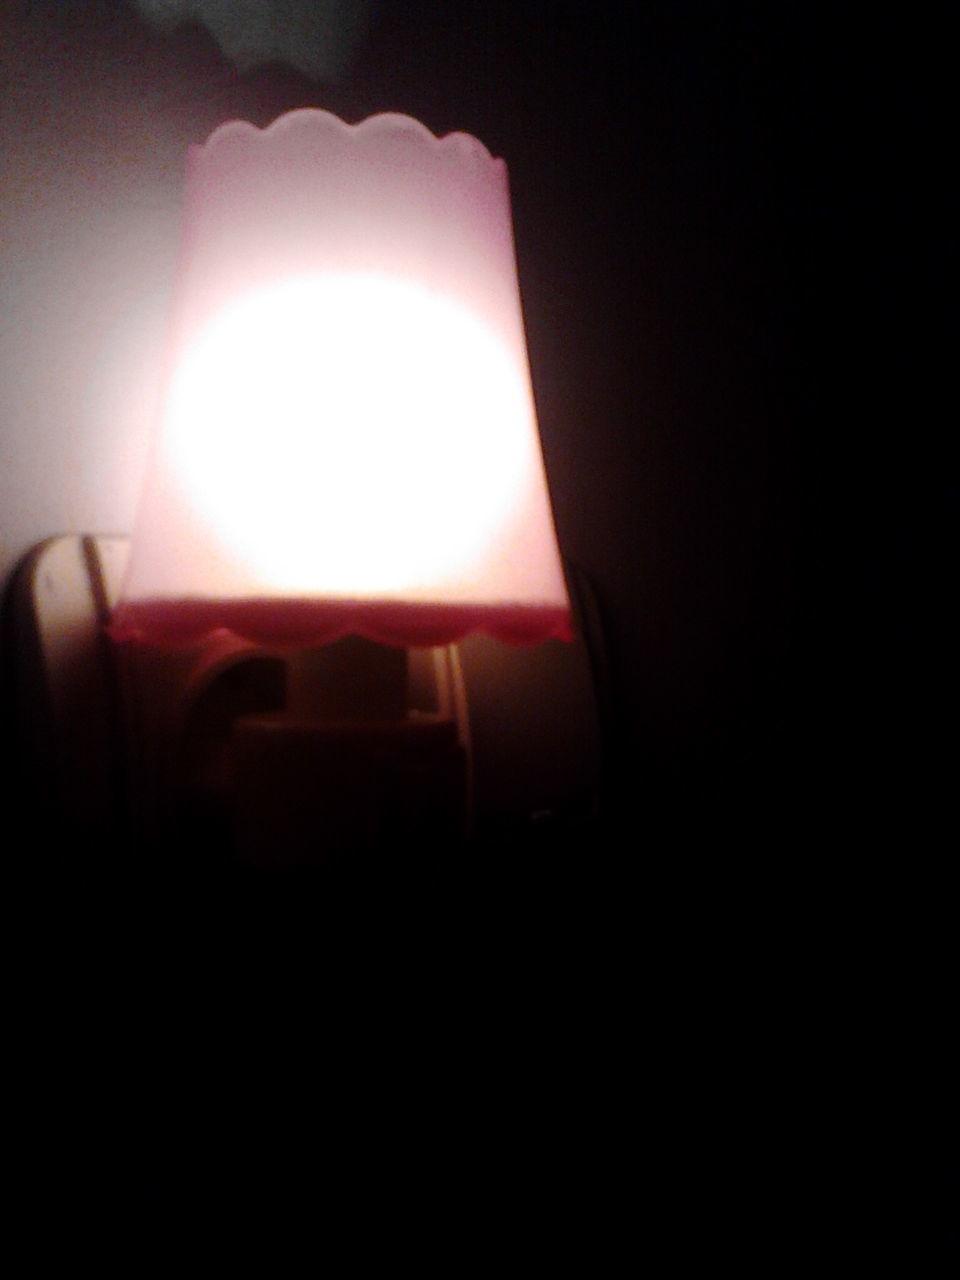 illuminated, lighting equipment, glowing, dark, darkroom, indoors, no people, close-up, night, nature